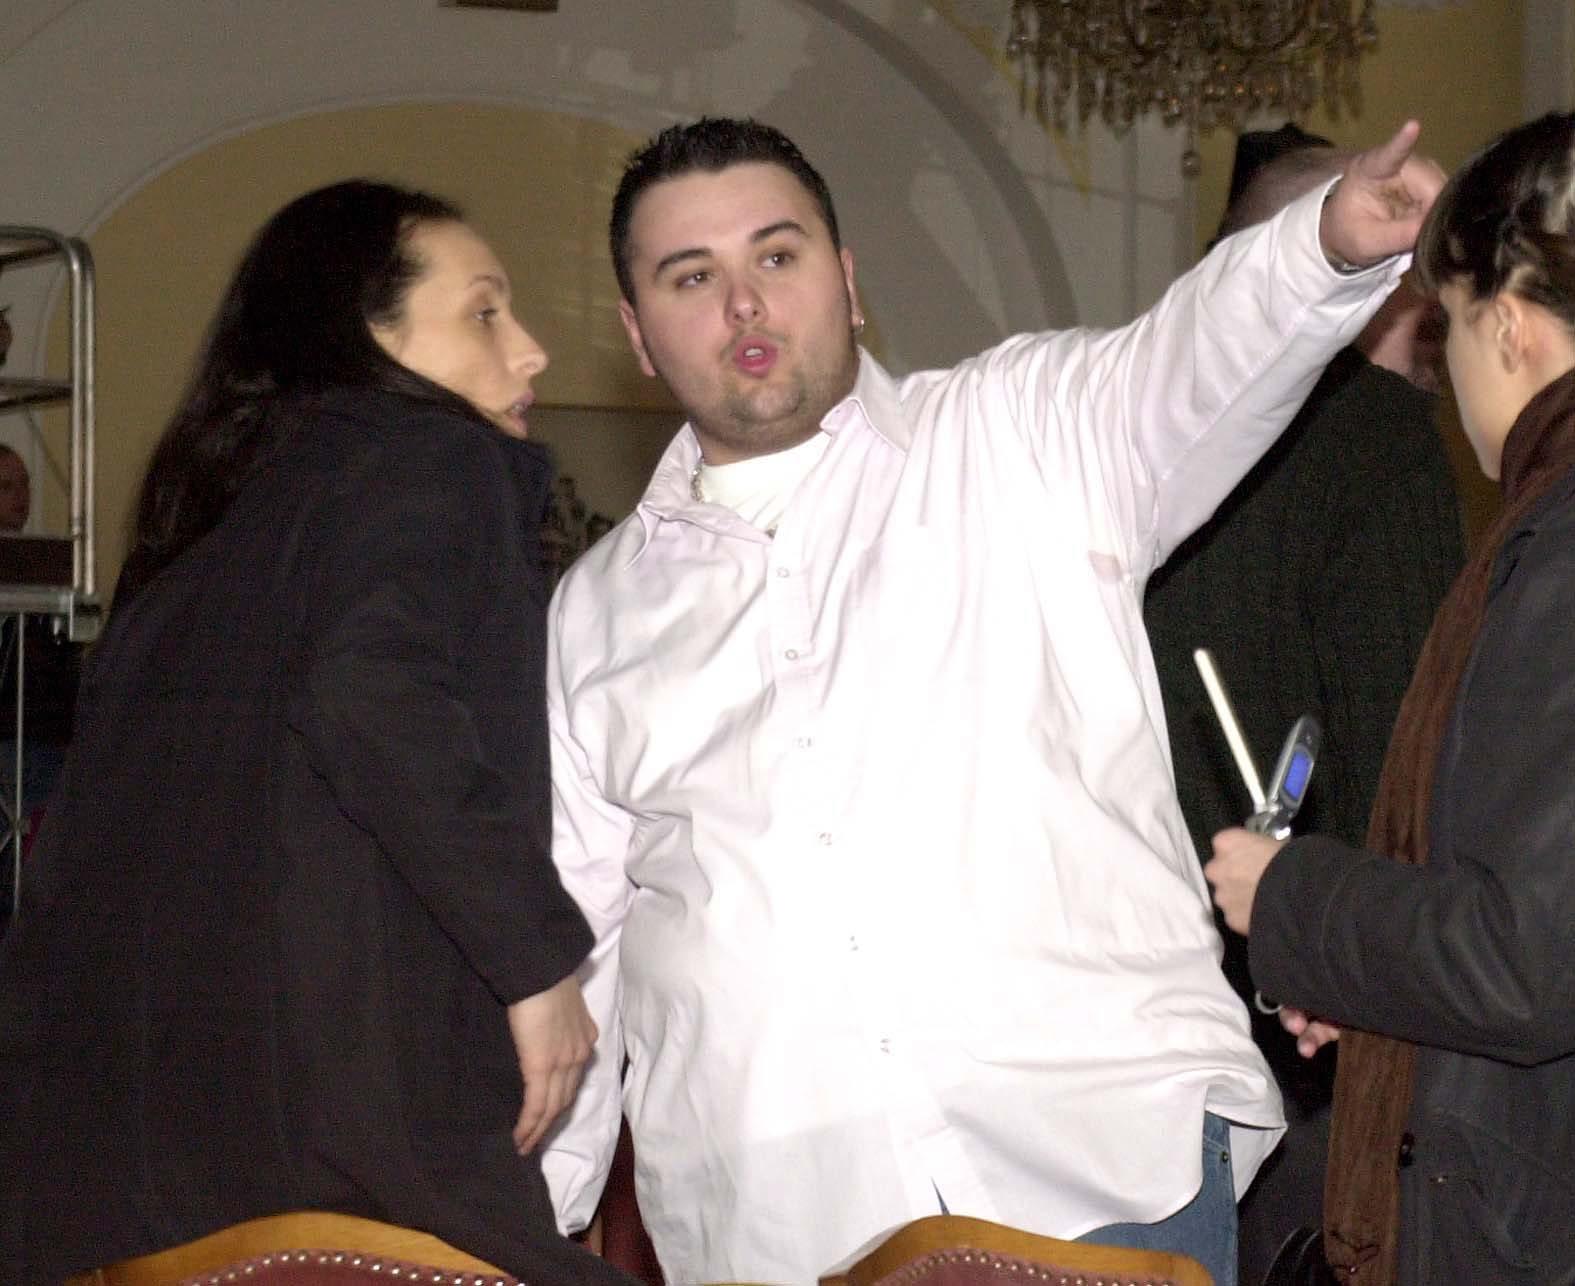 opatija,120304 dora    jacques houdek na probi u hotelu kvarner foto zeljko sop -ziv-